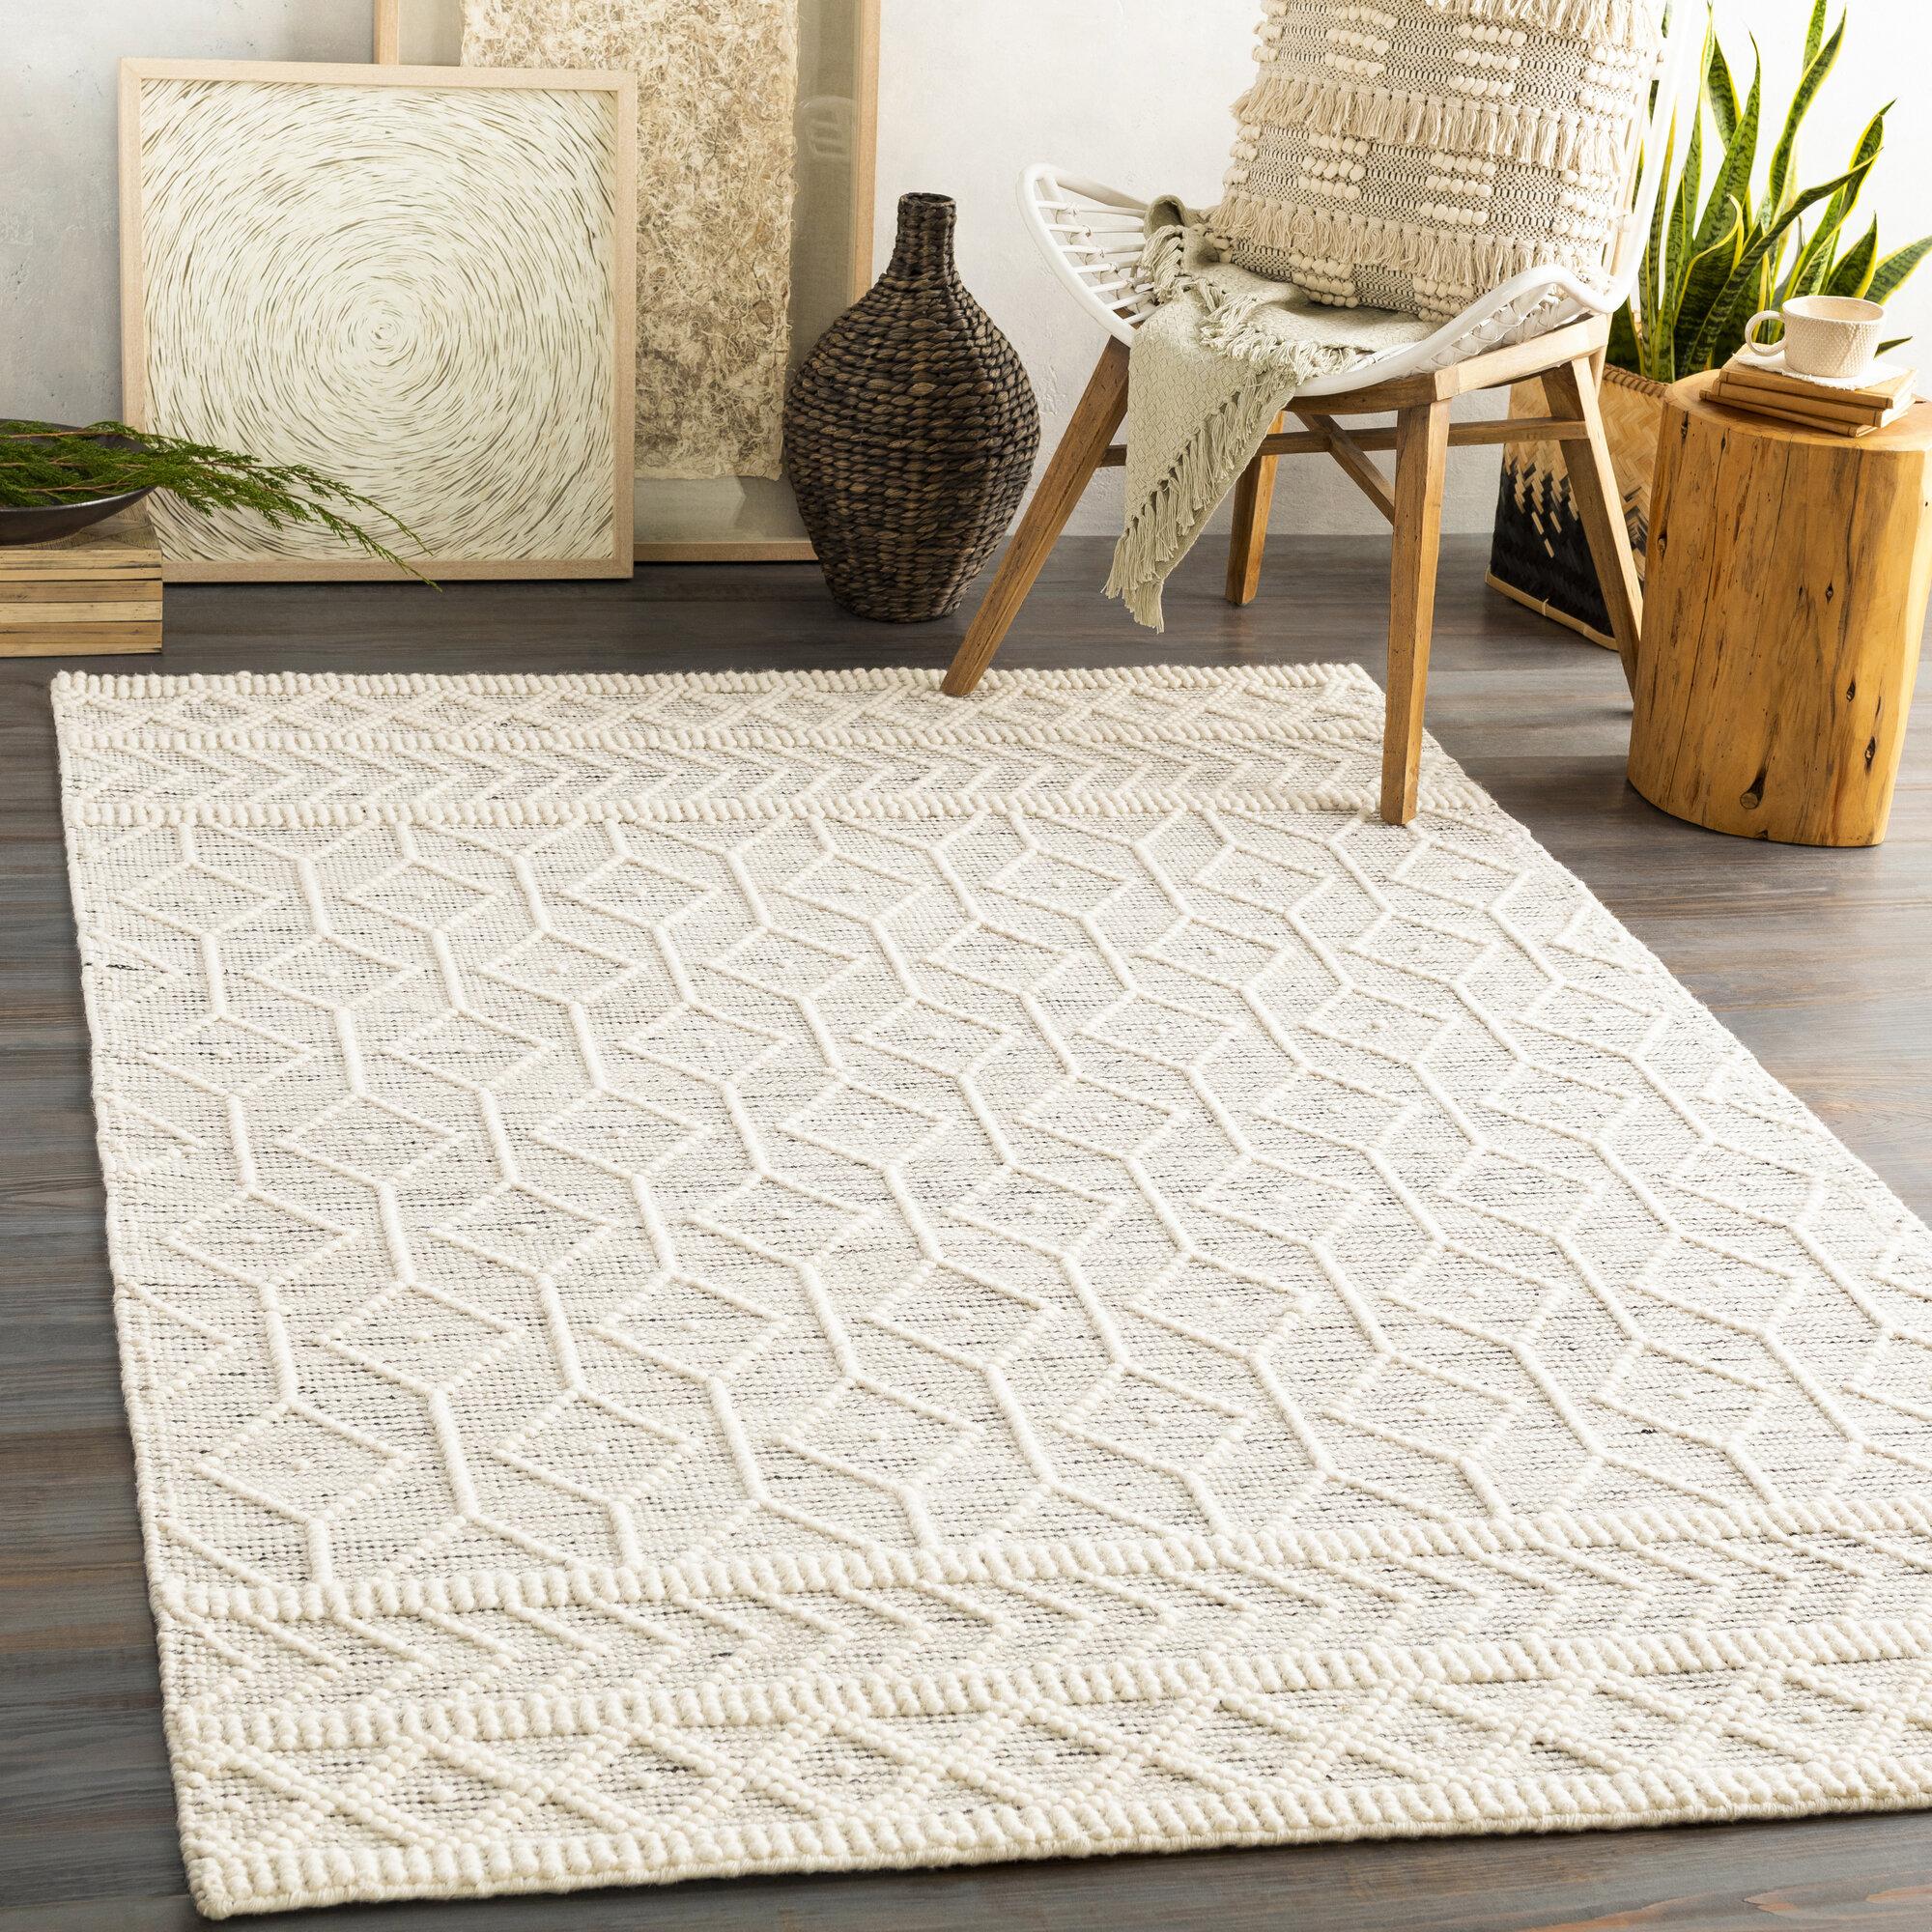 Handmade Flatweave Wool Area Rug